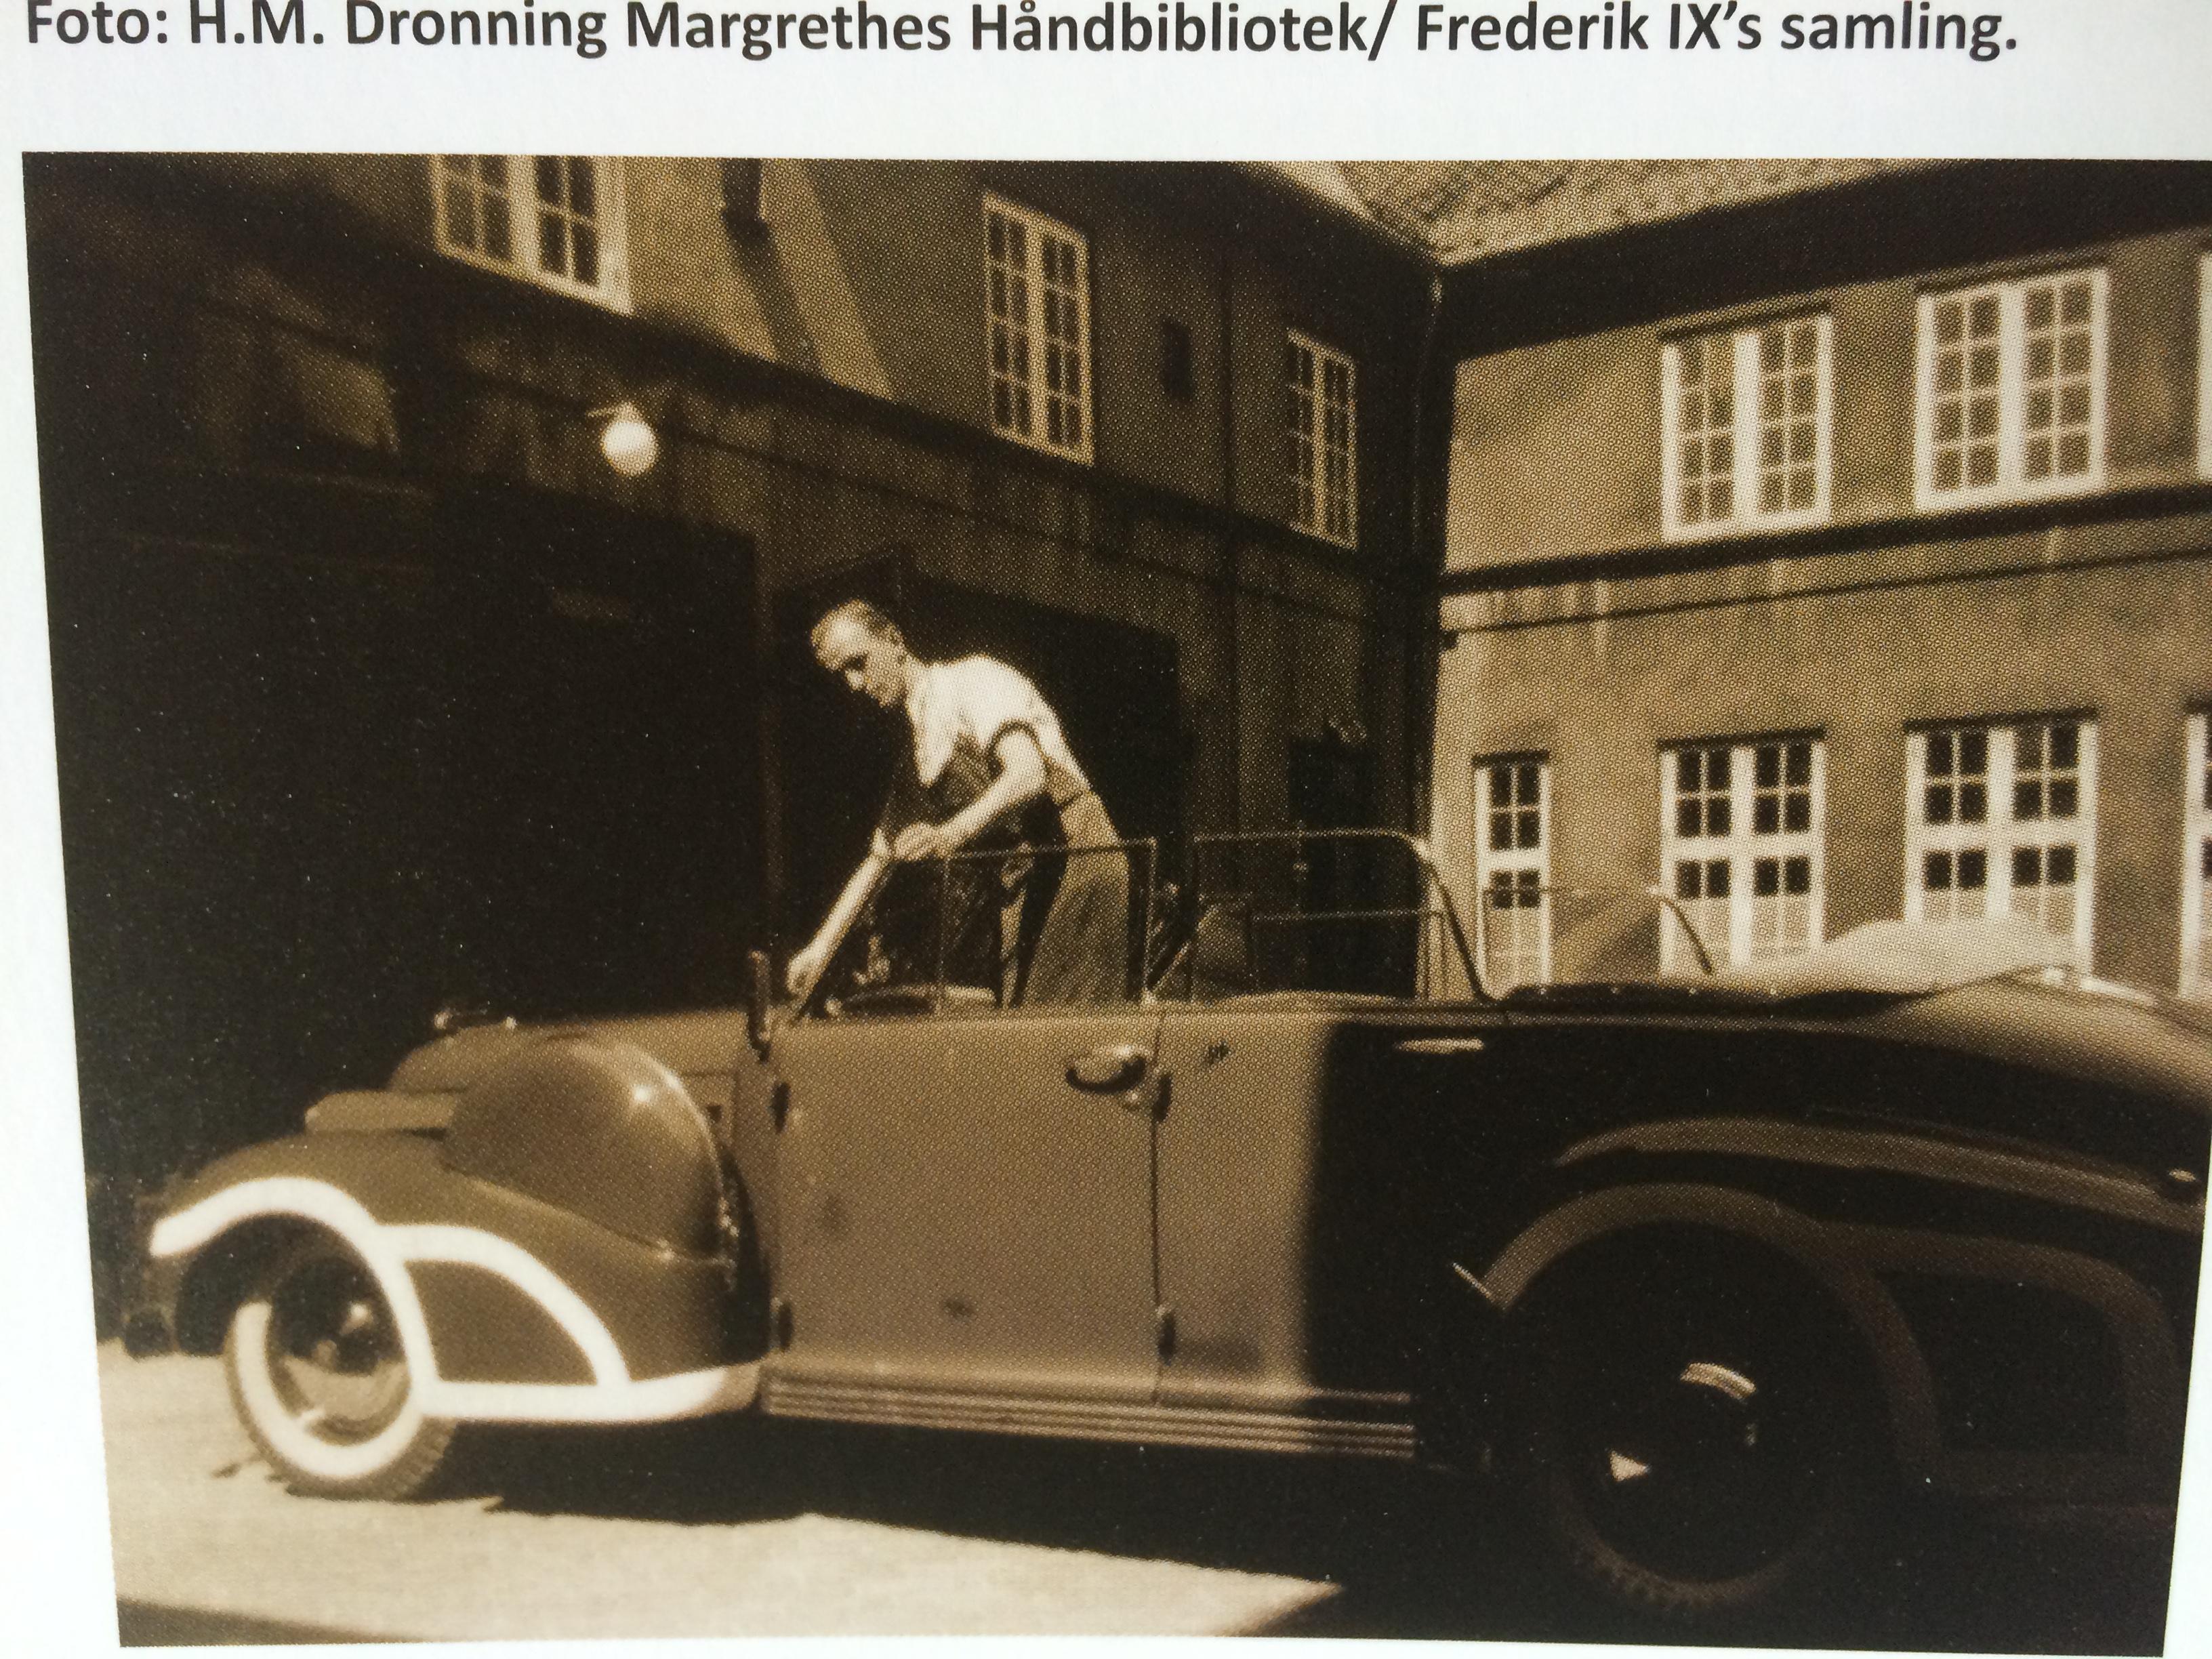 Kong Frederik IX bil samling